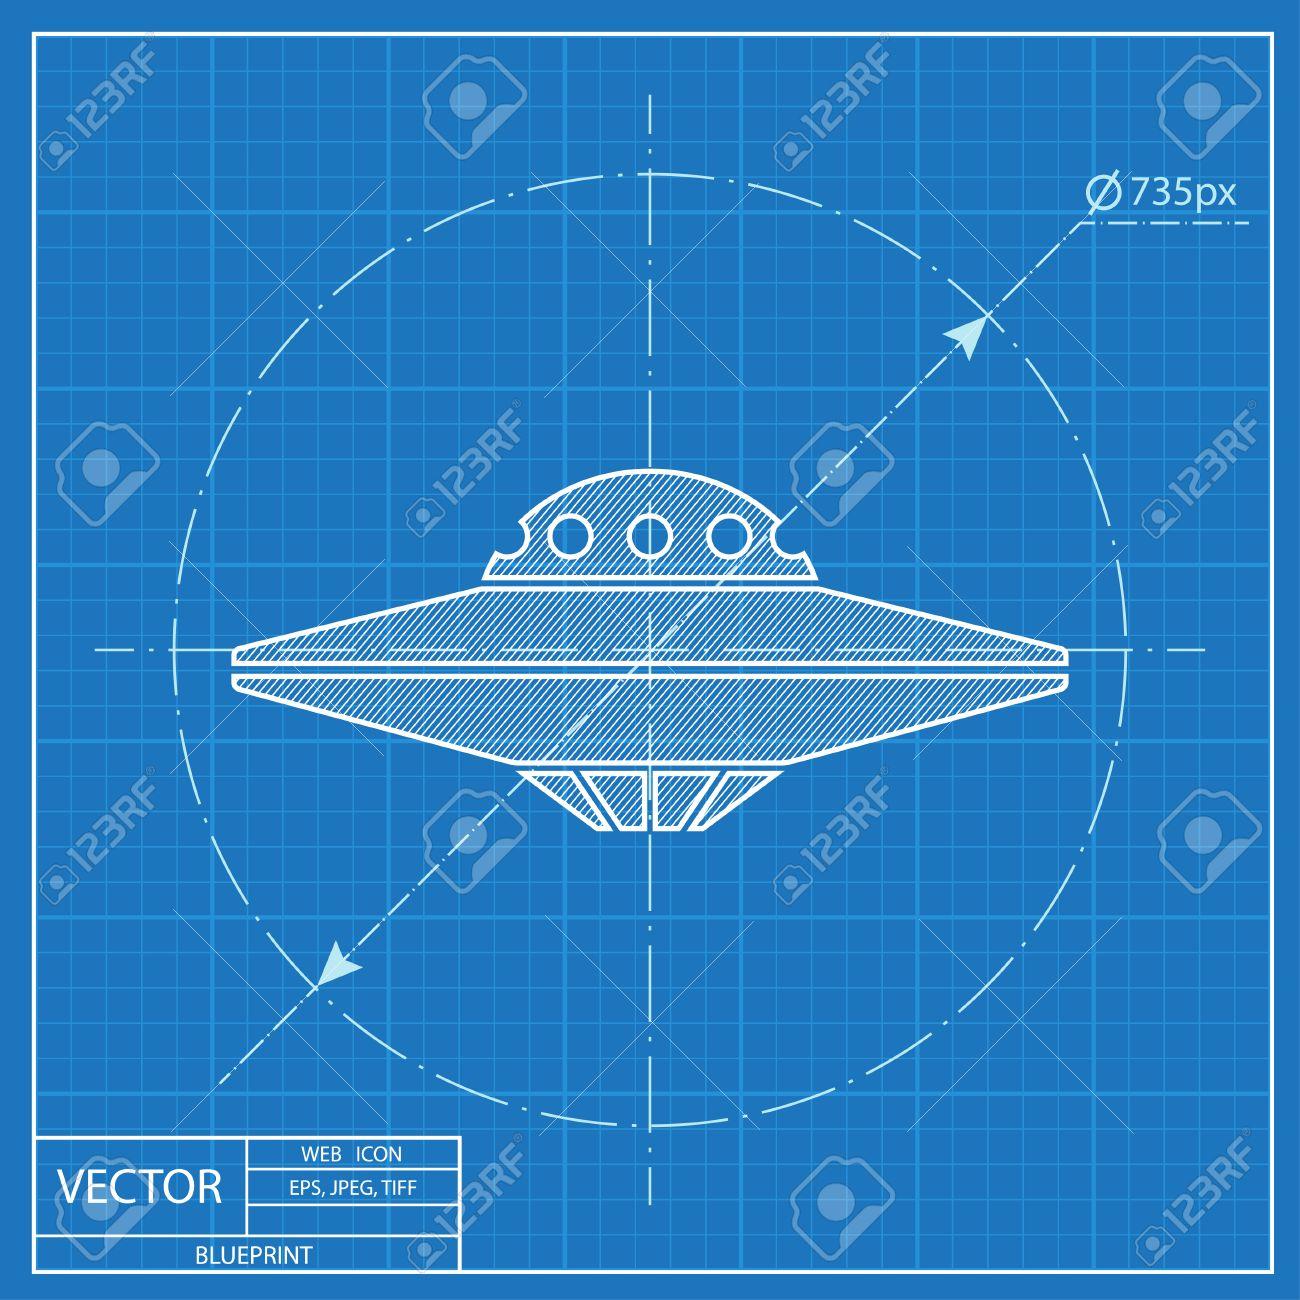 Ufo flying saucer icon blueprint style ilustraciones vectoriales blueprint style foto de archivo 55573076 malvernweather Gallery